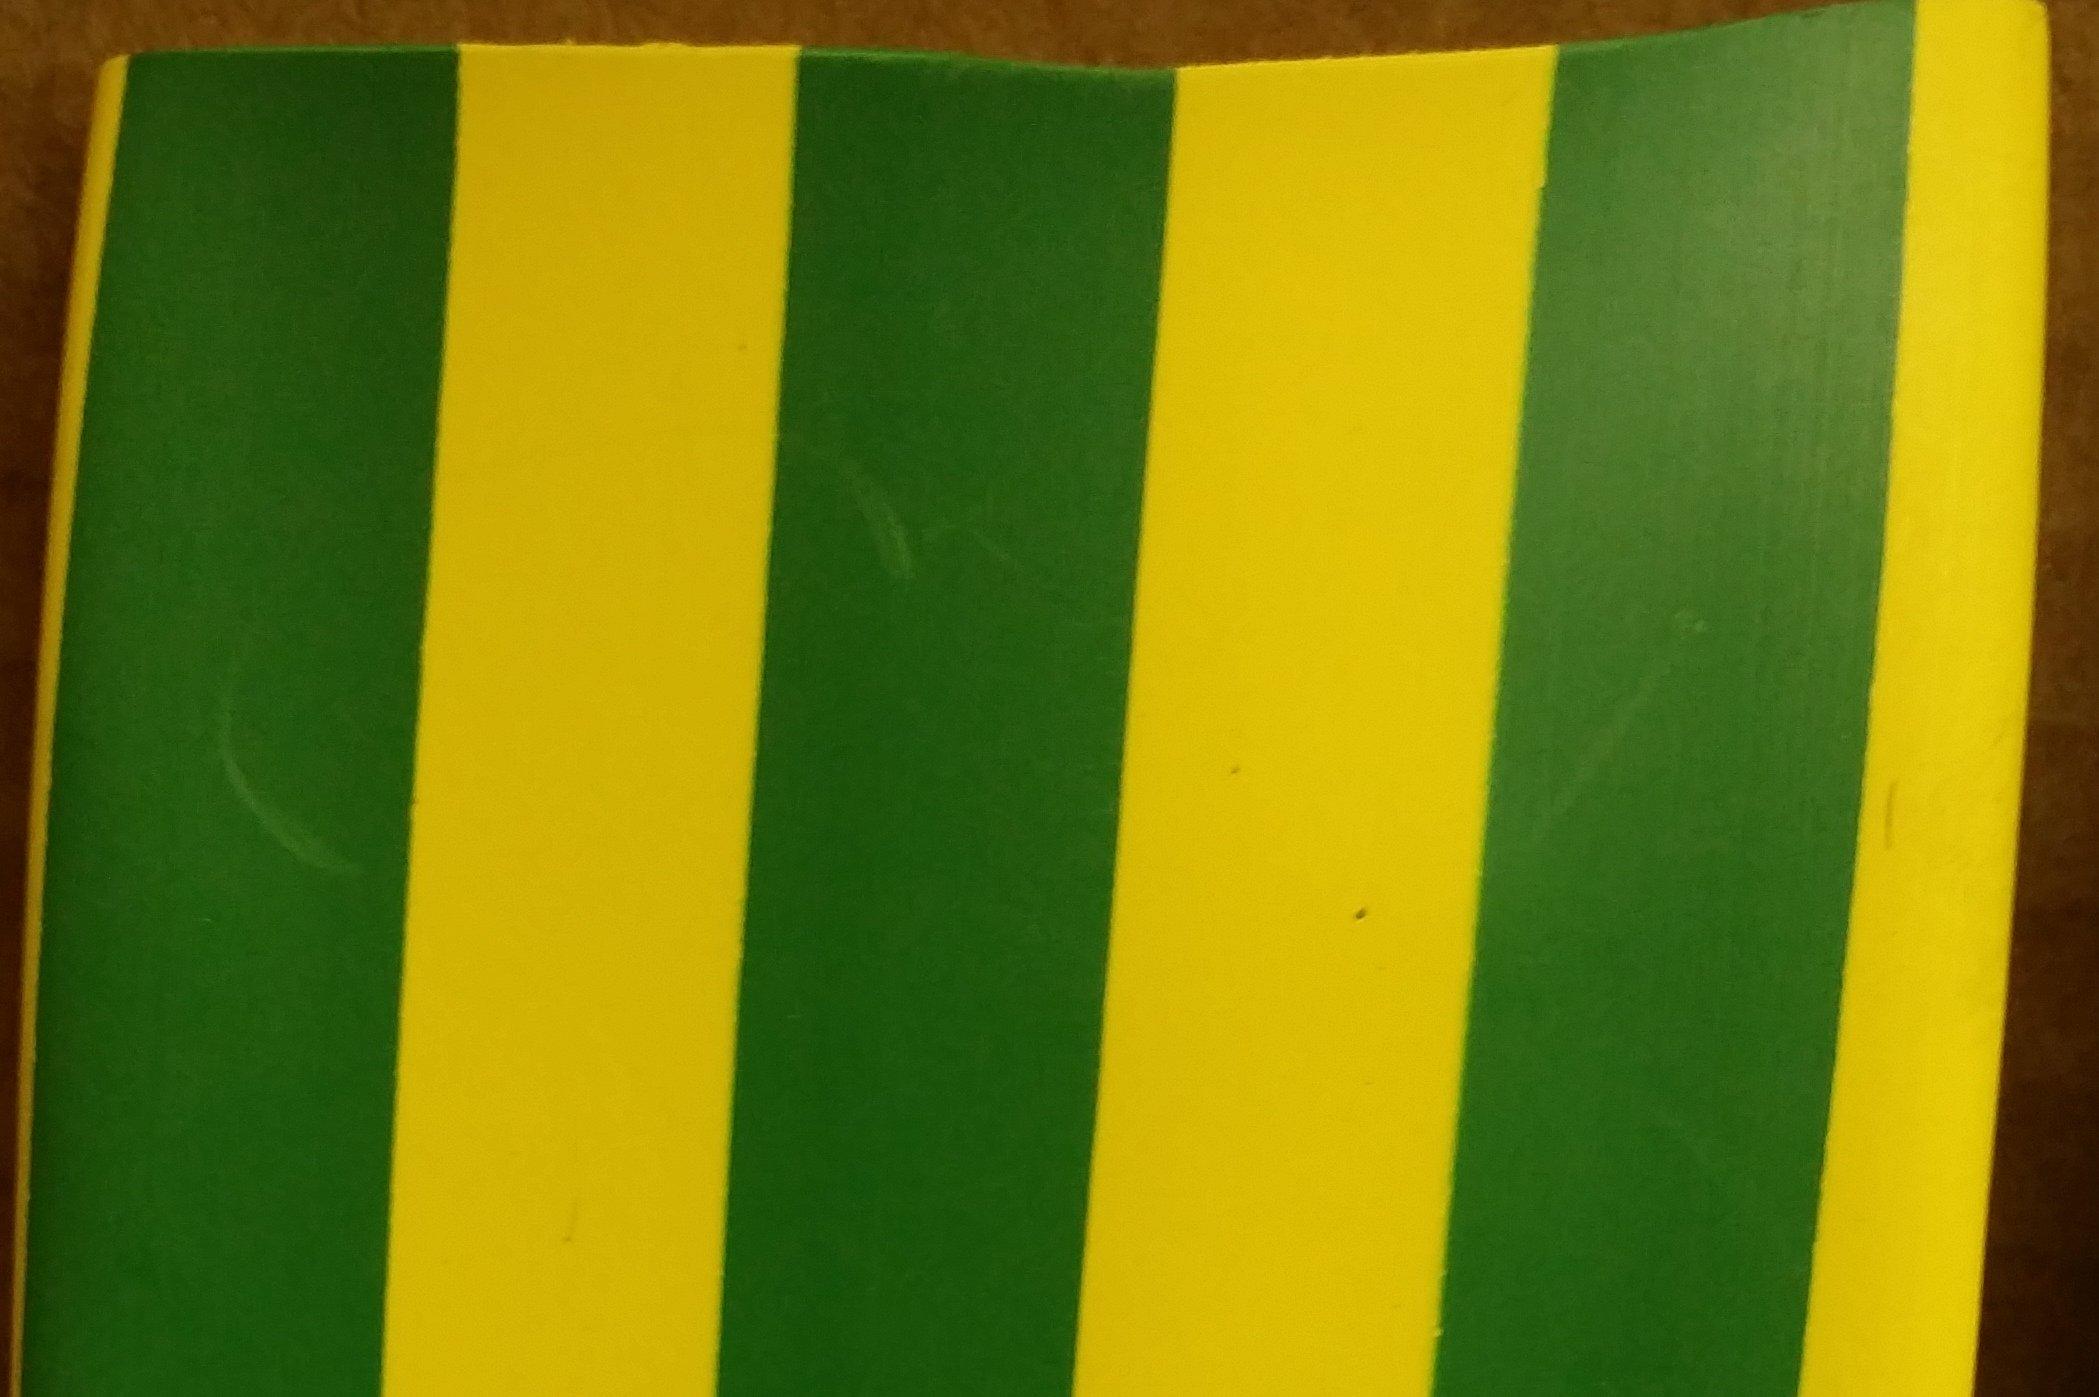 BuyHeatShrink 3/8'' 2:1 Polyolefin Heat Shrink Tubing - Yellow/Green - (250 ft/spool)